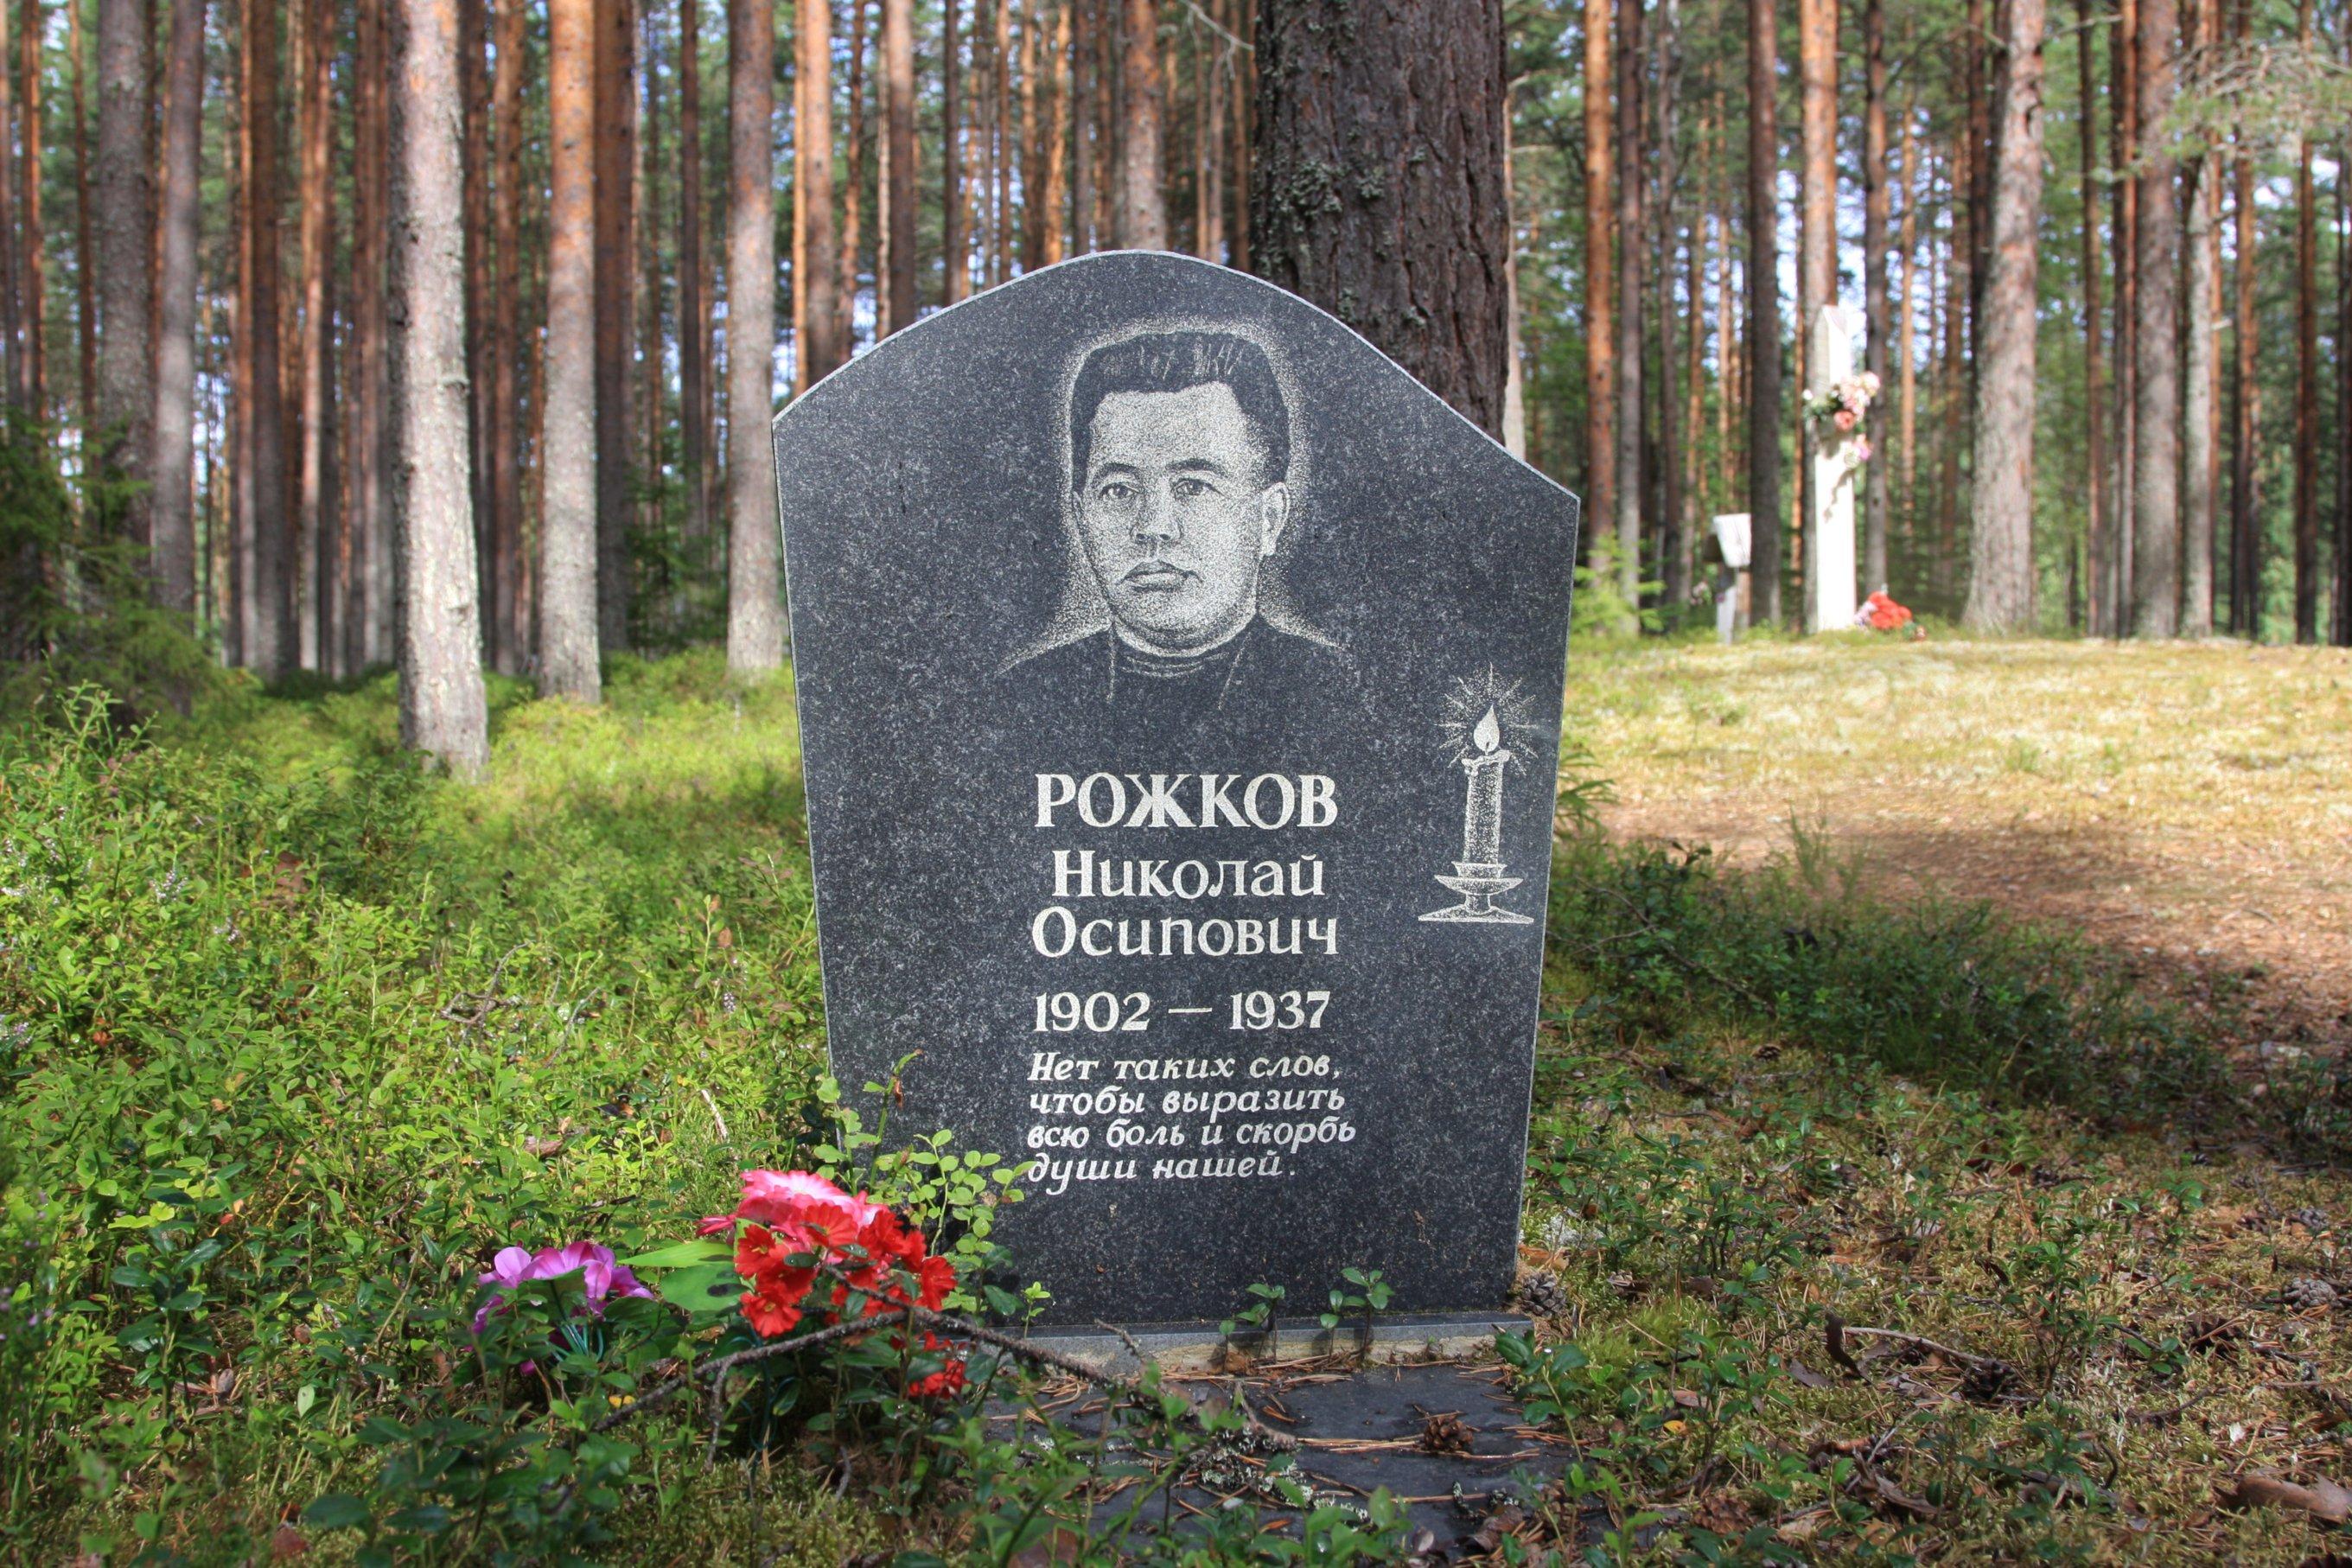 Памятная табличка «Рожков Николай Осипович». Фото 04.08.2018.